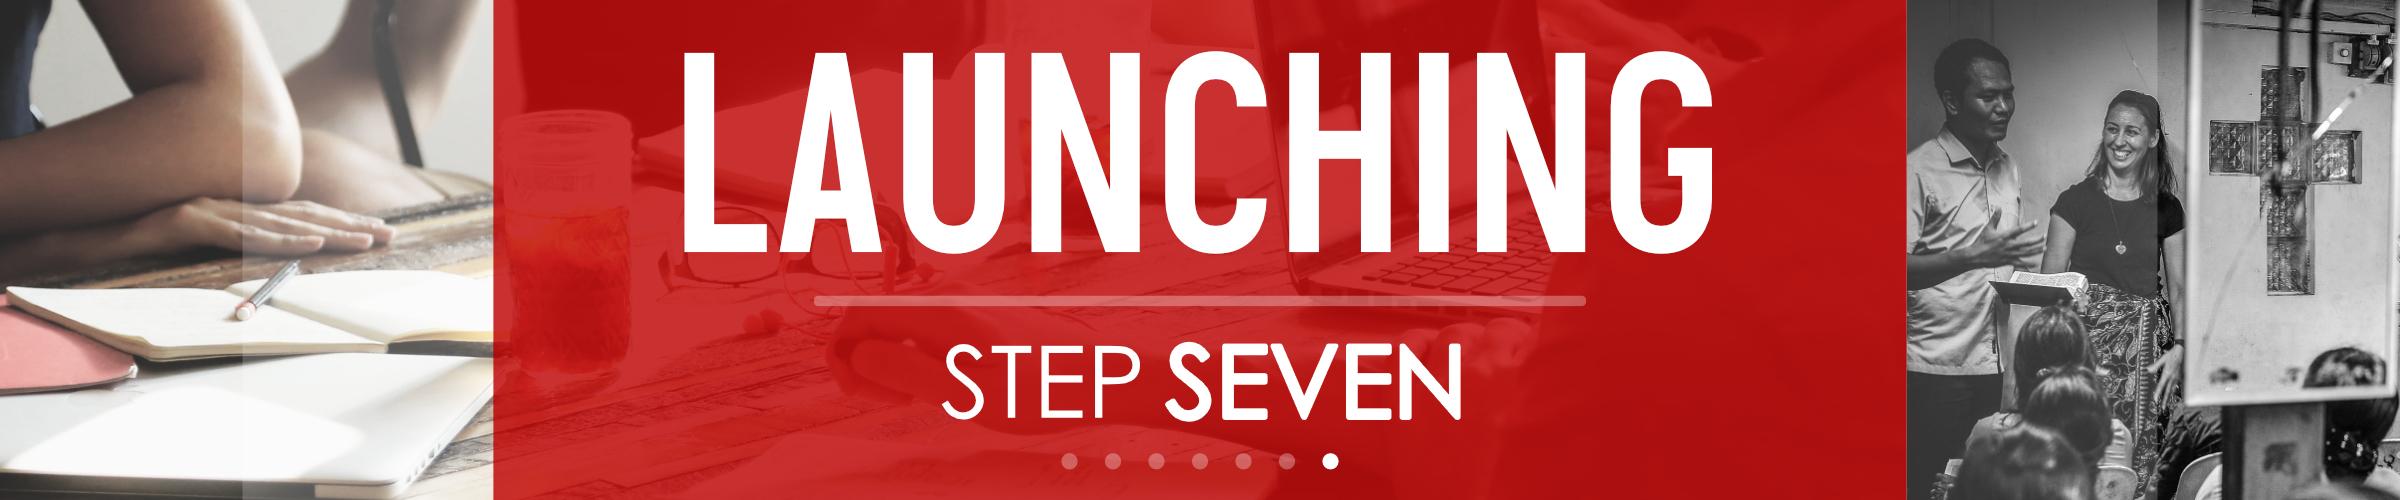 Launching - Step 7.jpg